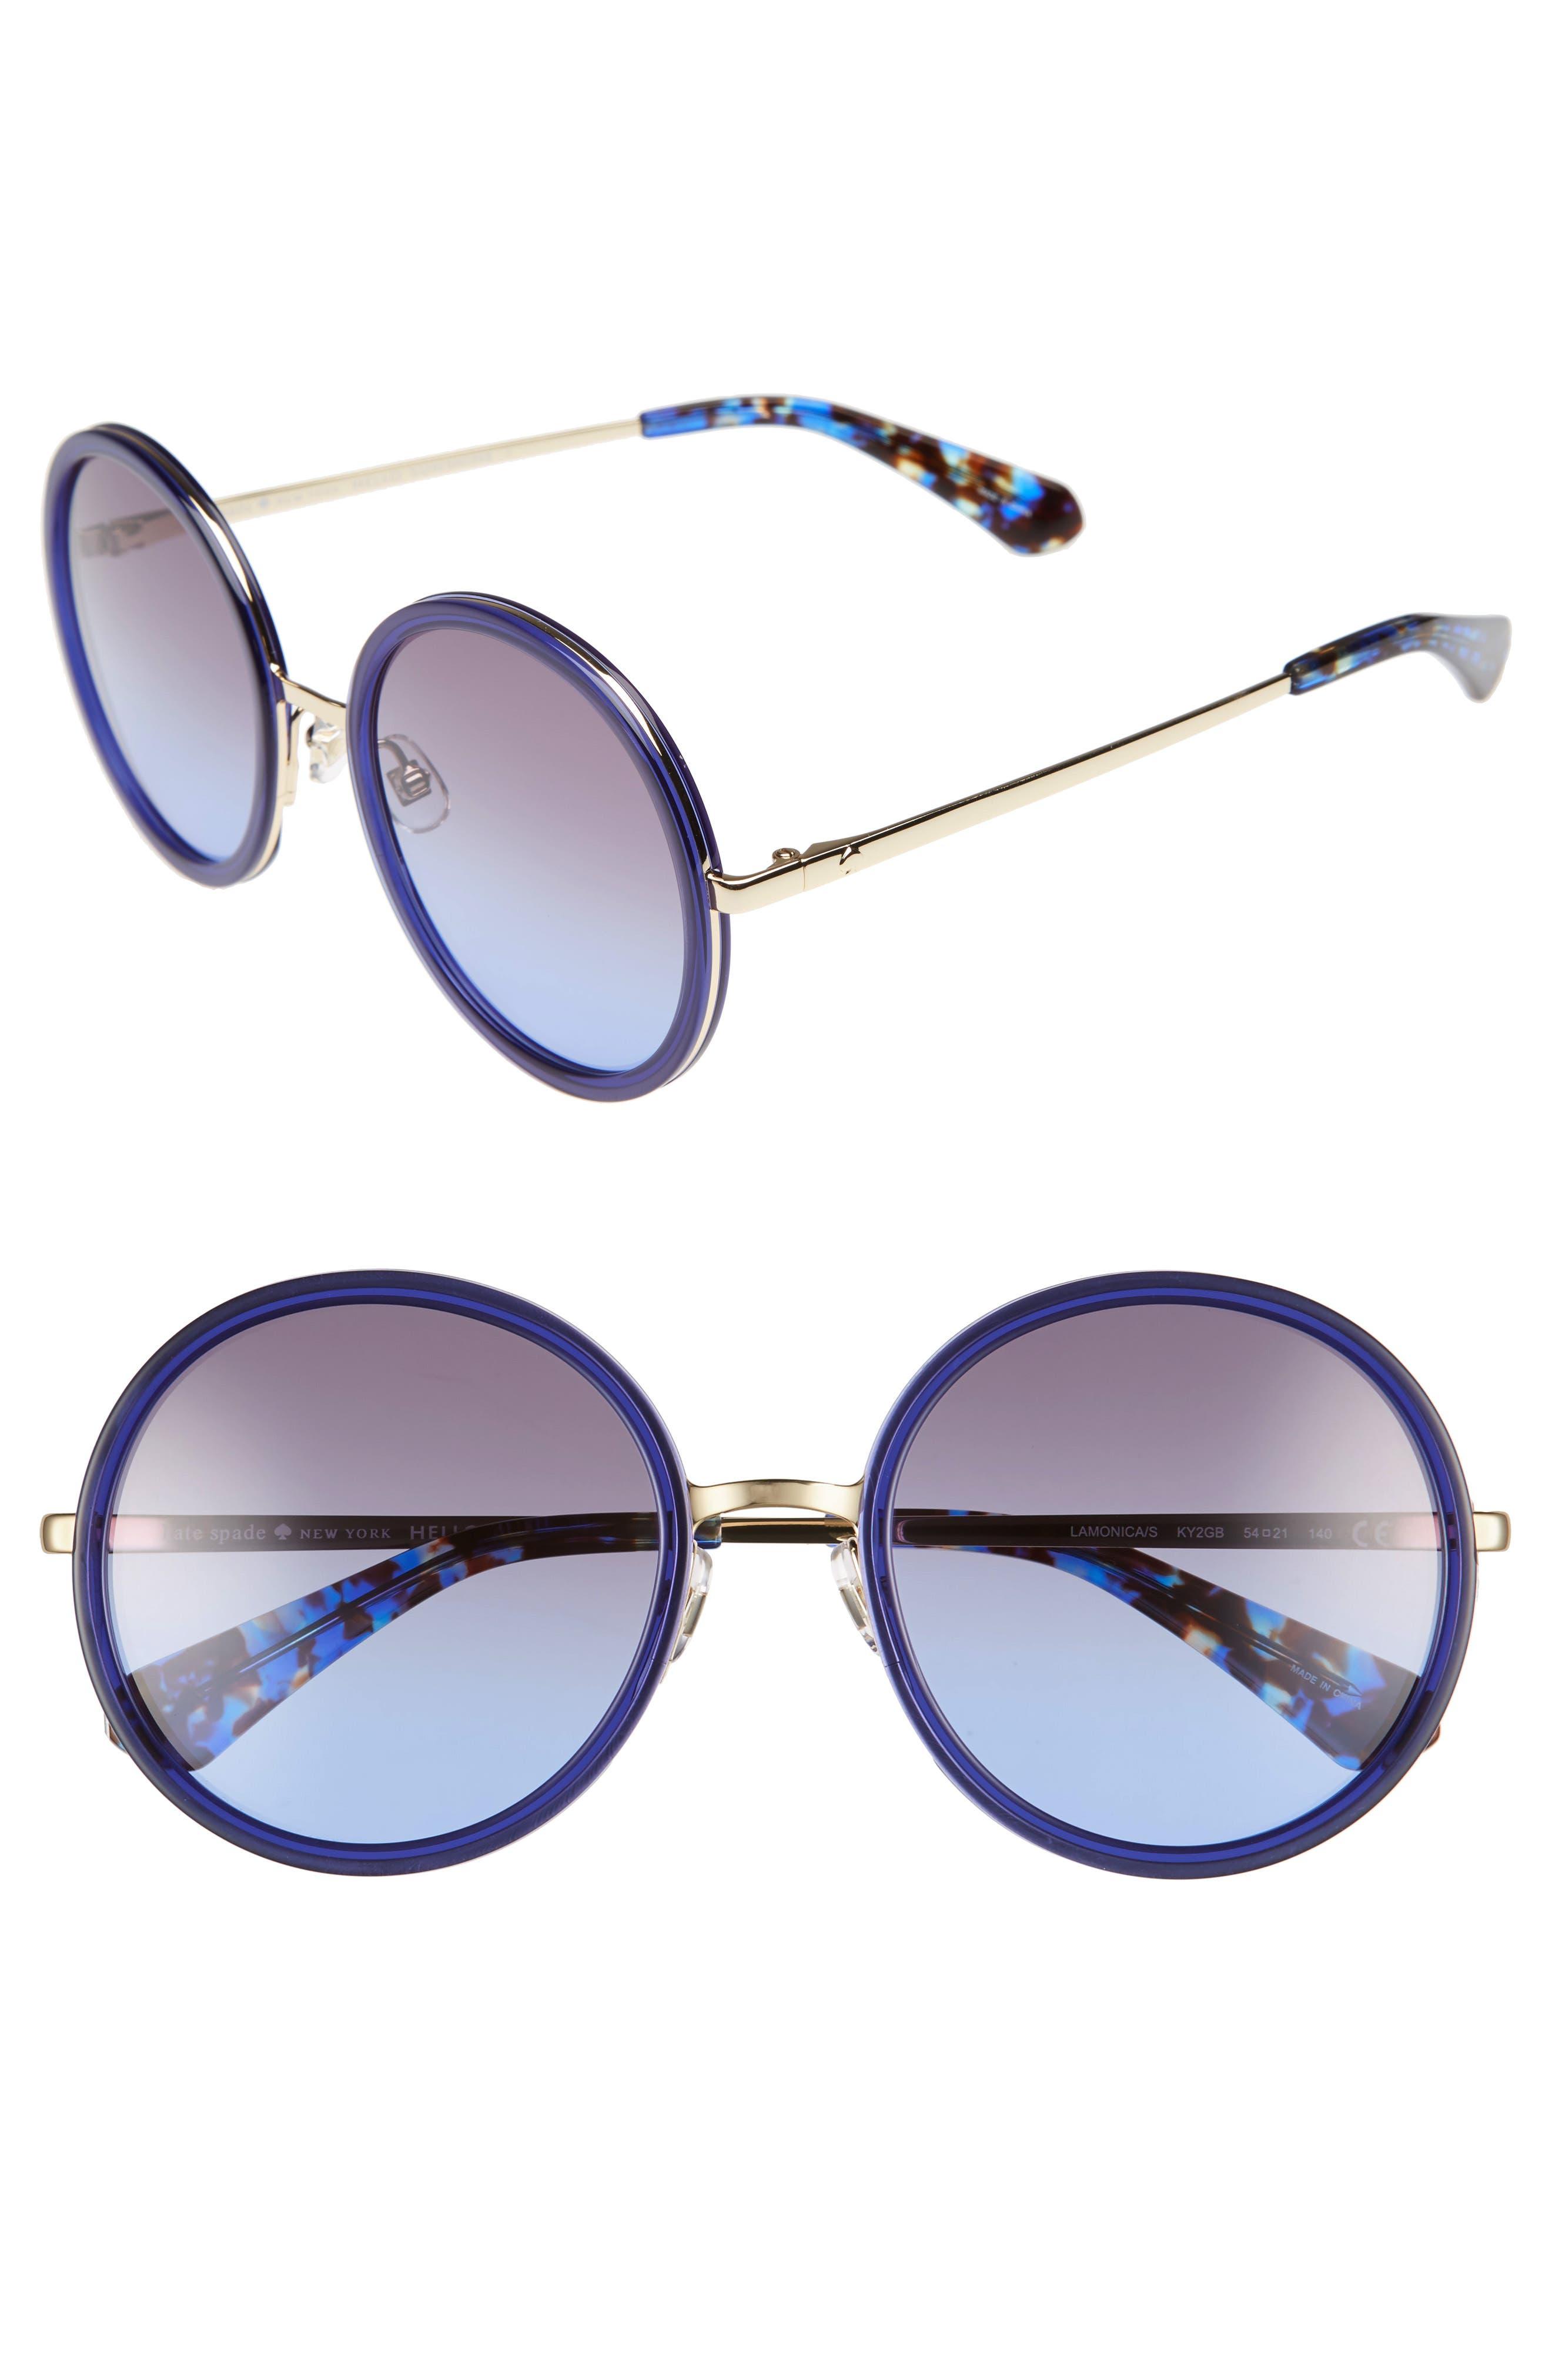 a6a264151f Kate Spade Lamonica 54Mm Gradient Lens Round Sunglasses - Blue  Gold